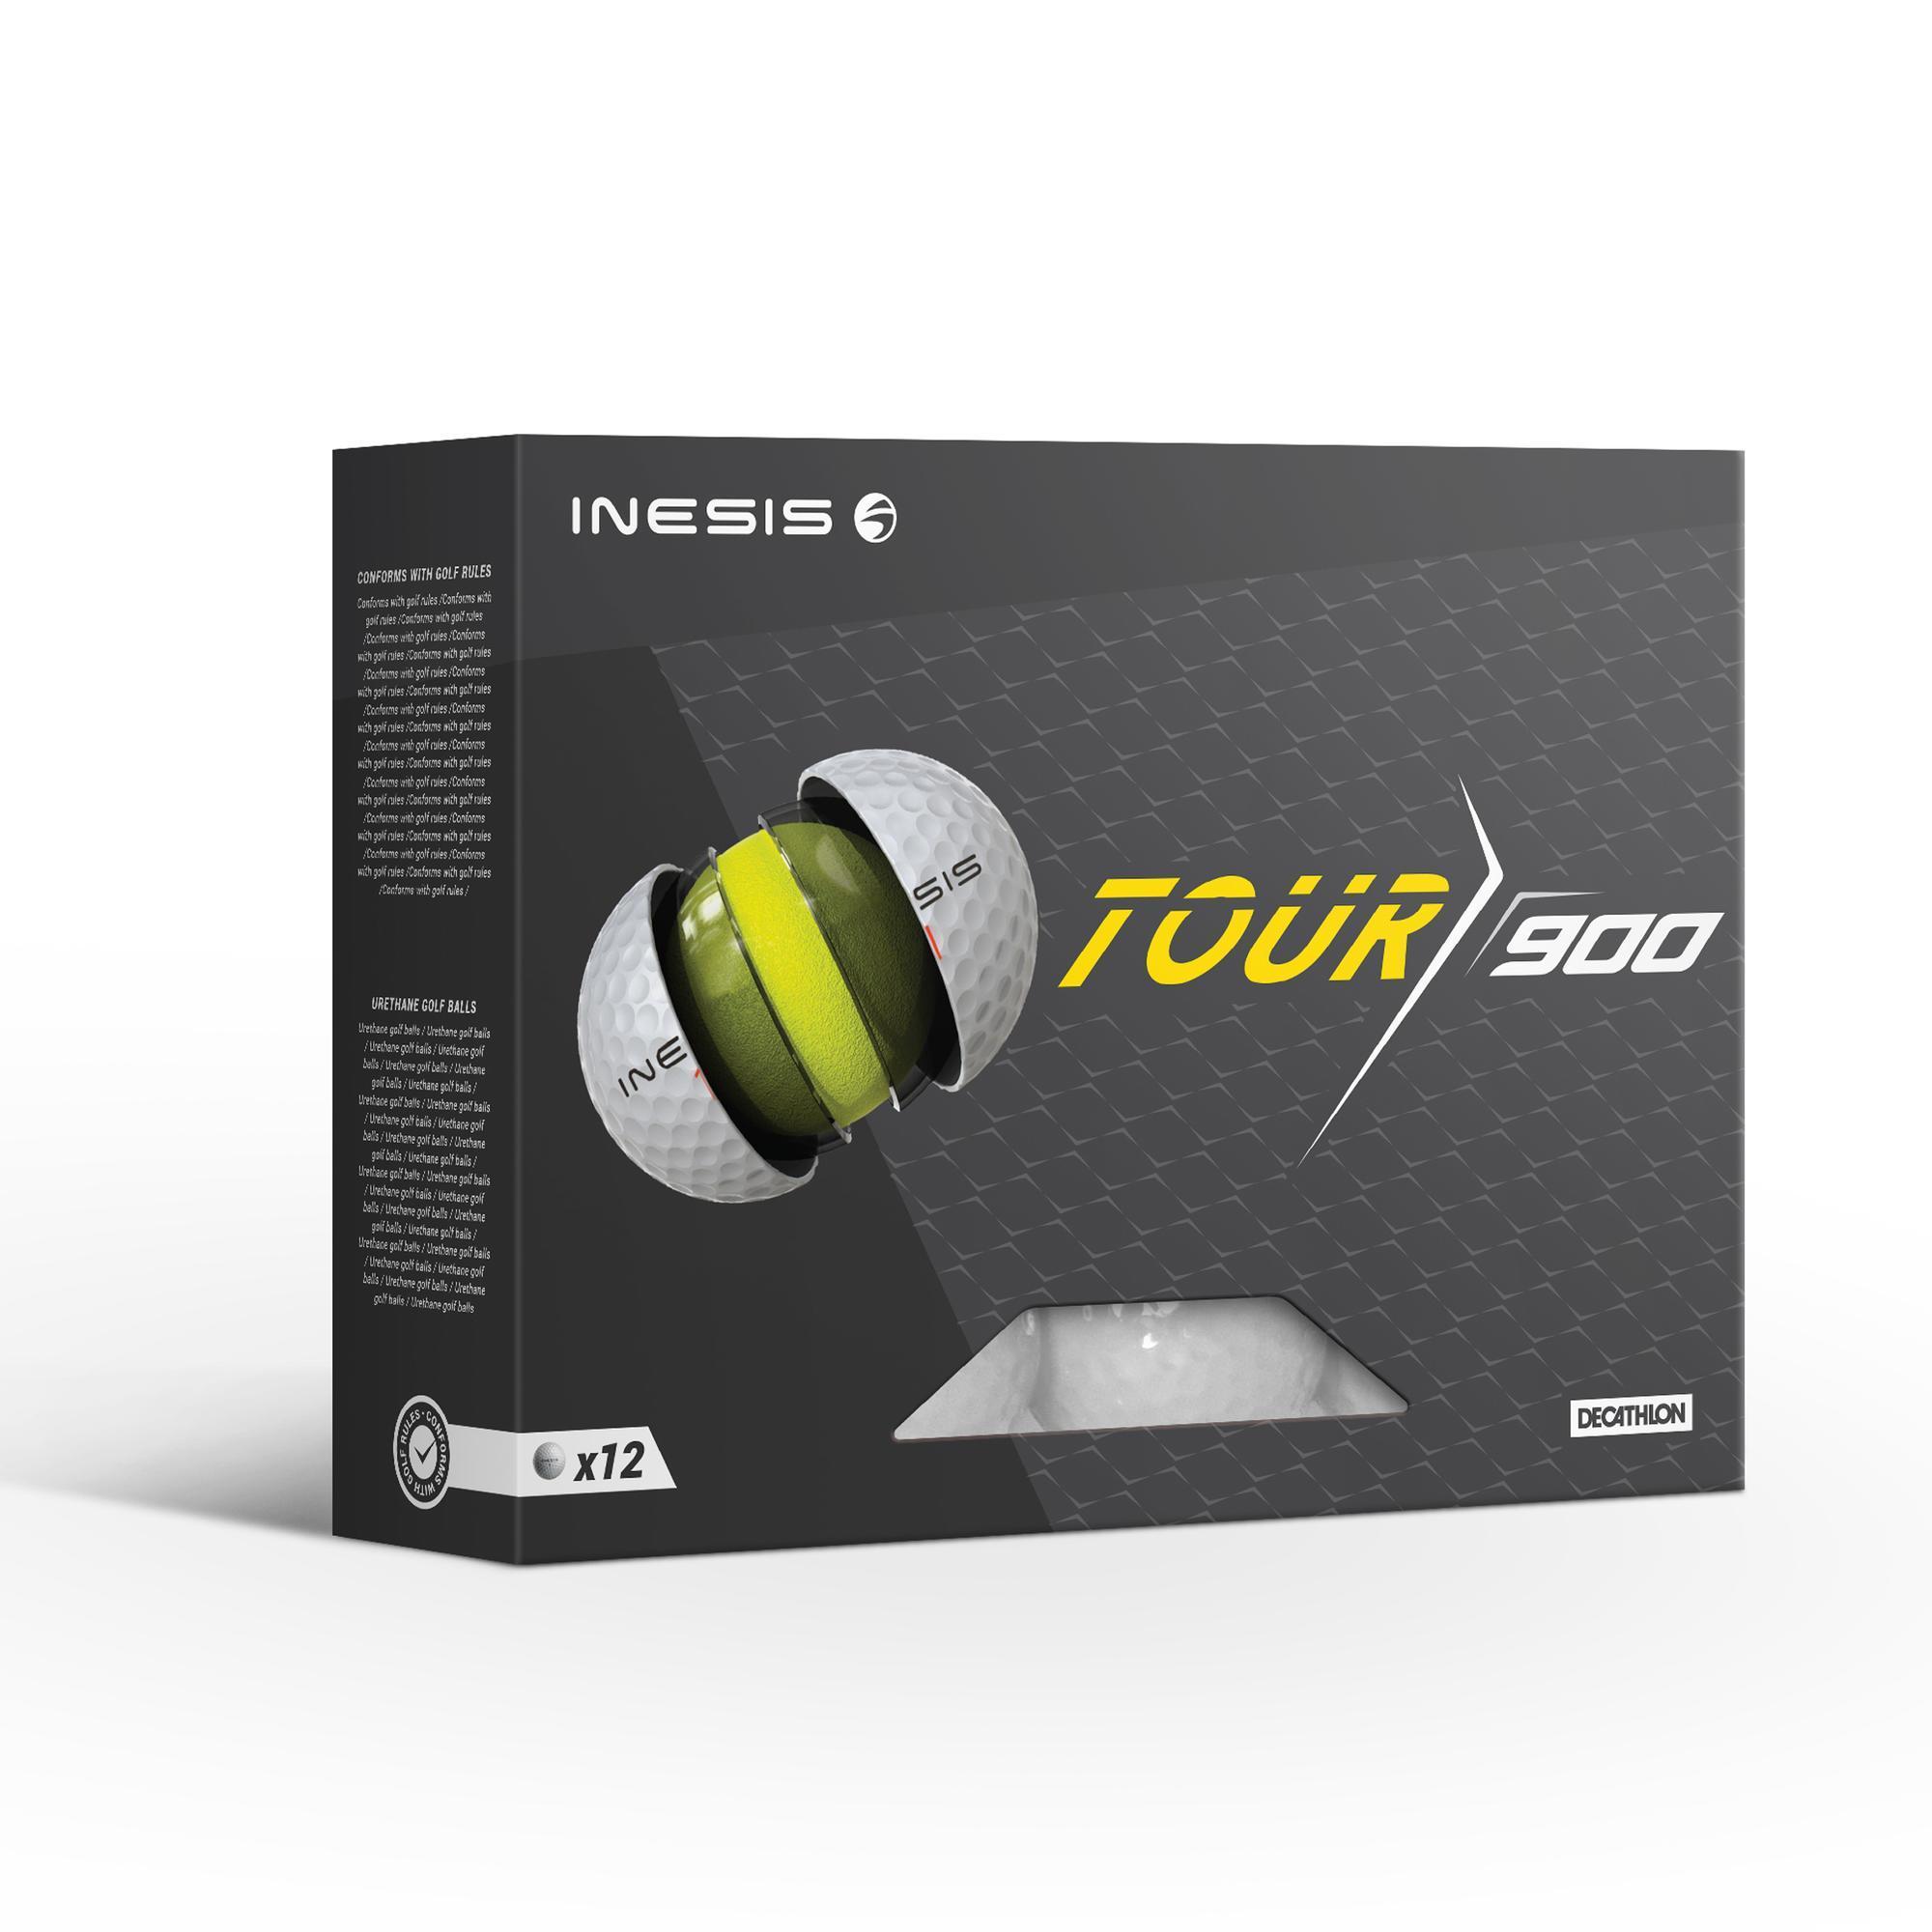 Inesis Golfbal Tour 900 x12 wit thumbnail